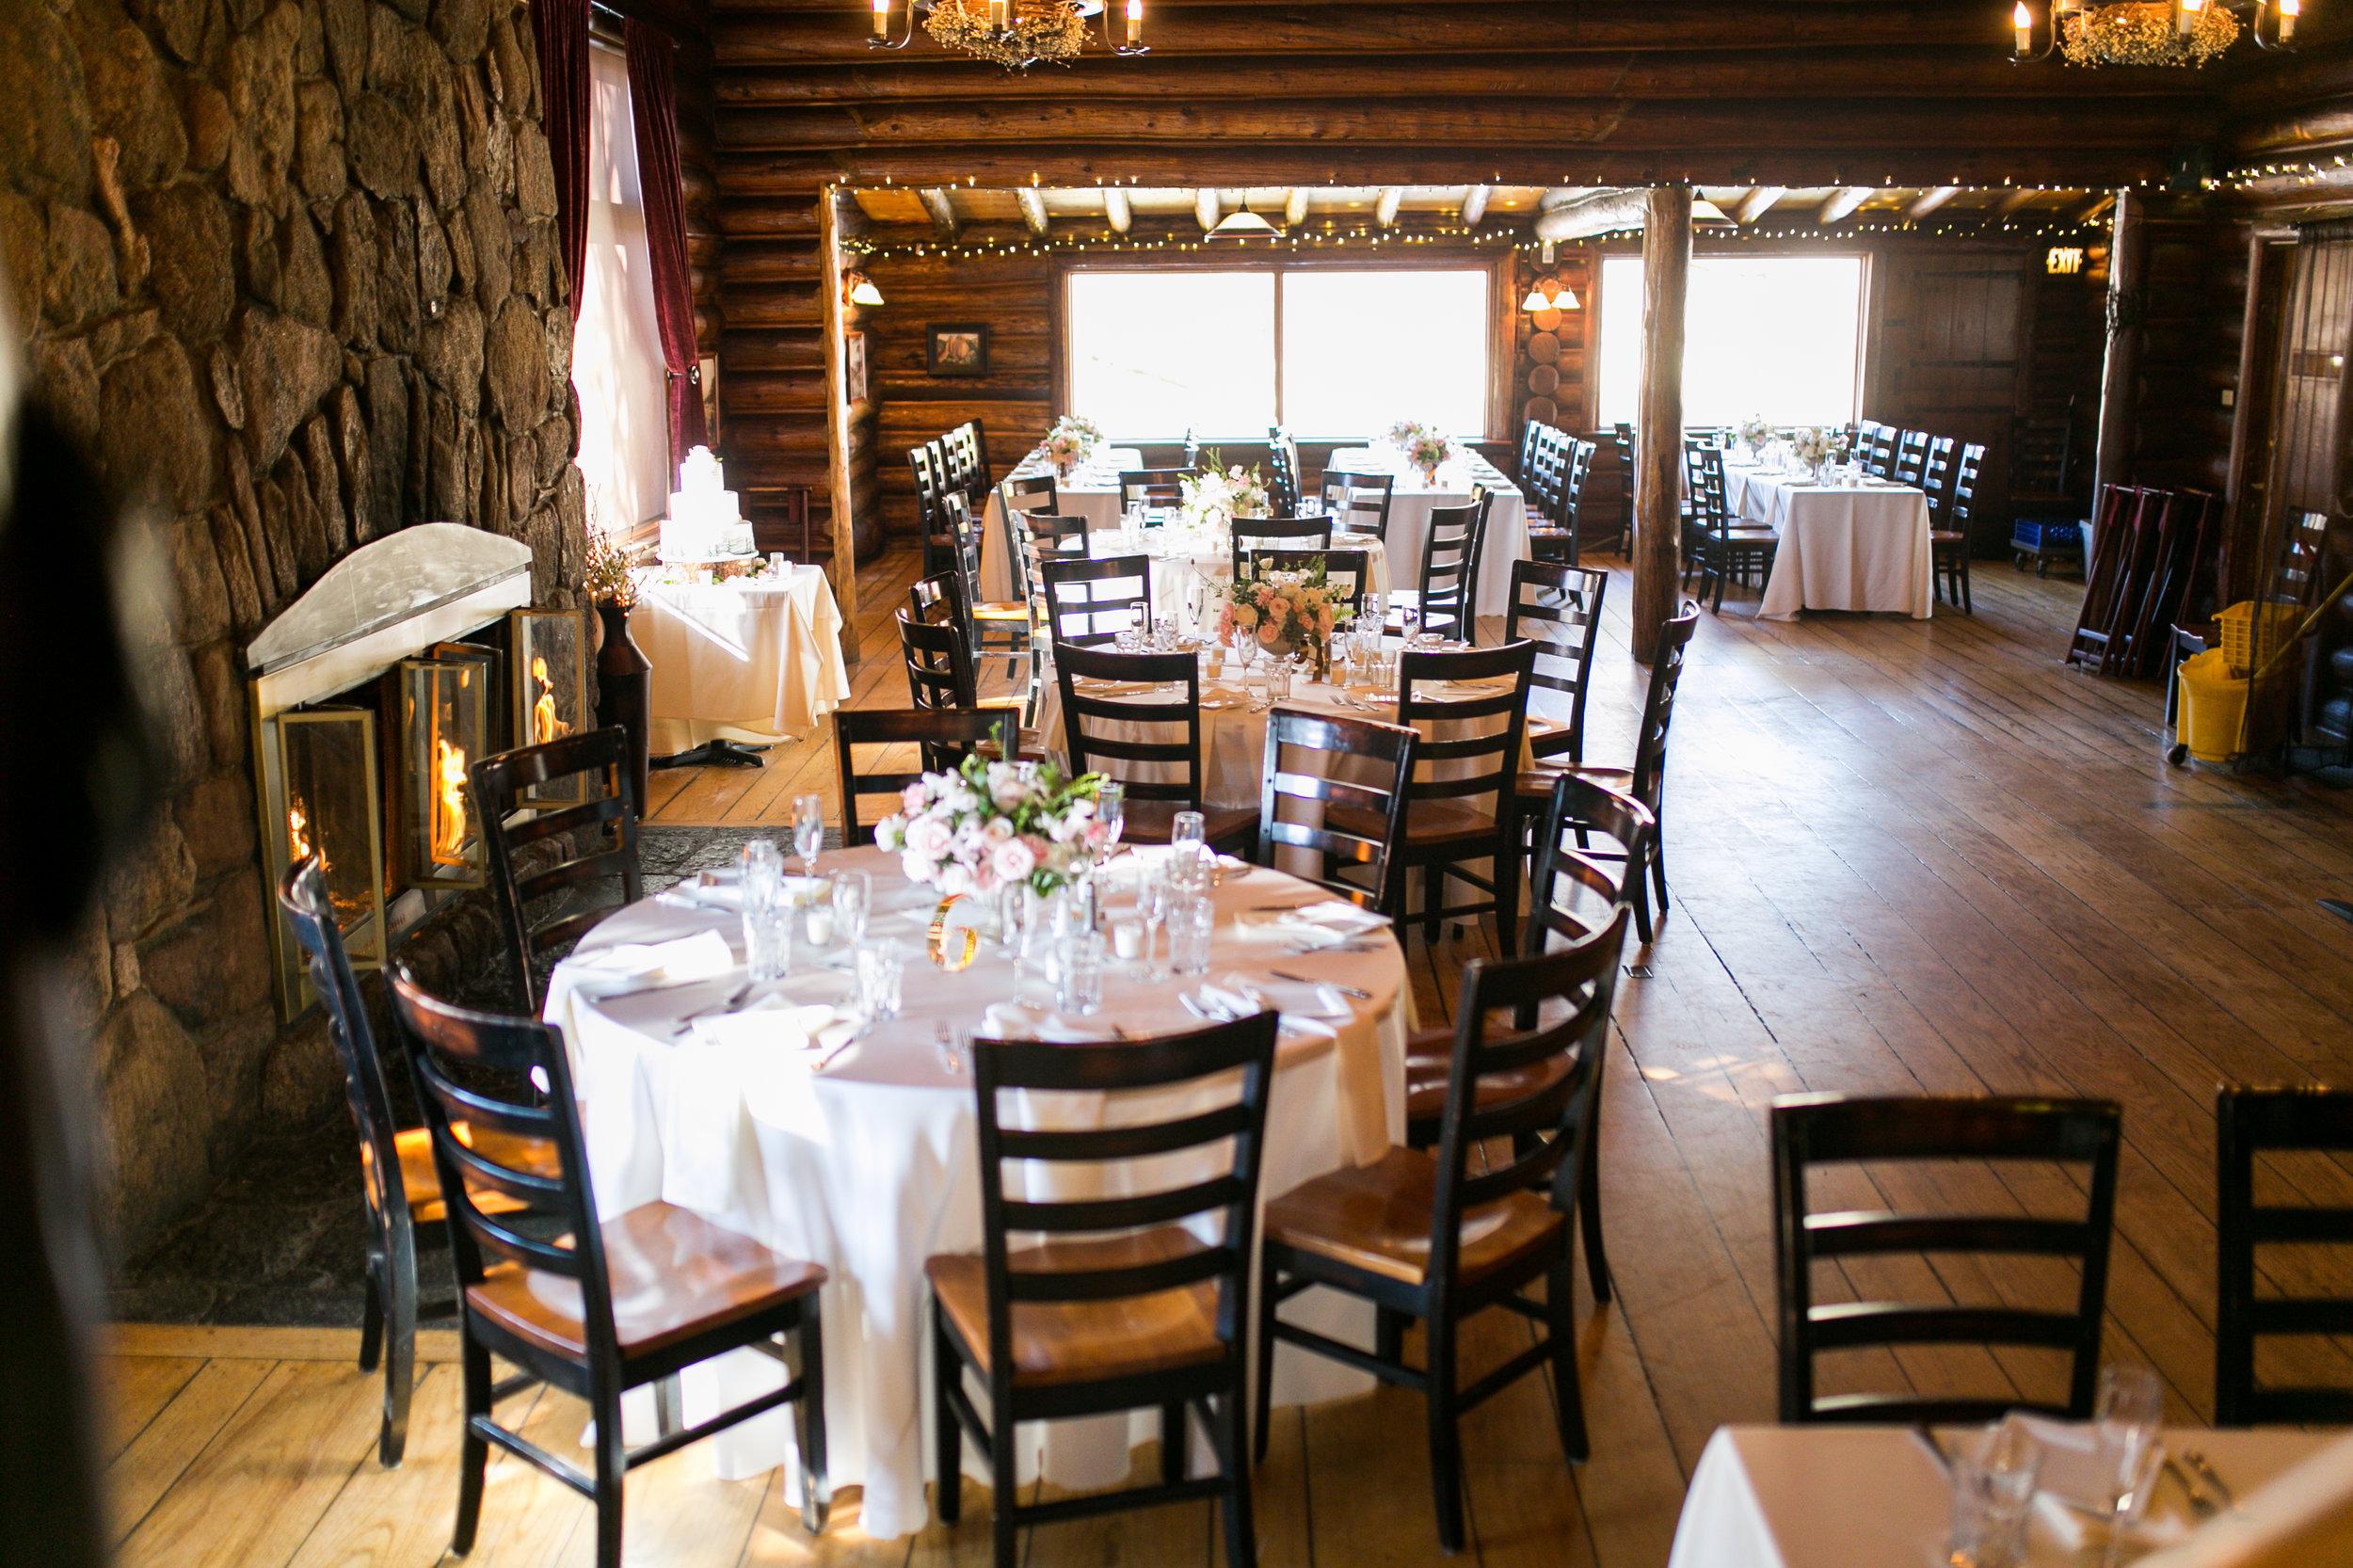 Twin_Owls_Steakhouse-wedding_photographer_Estes_Park_Lisa_ODwyer-532.jpg